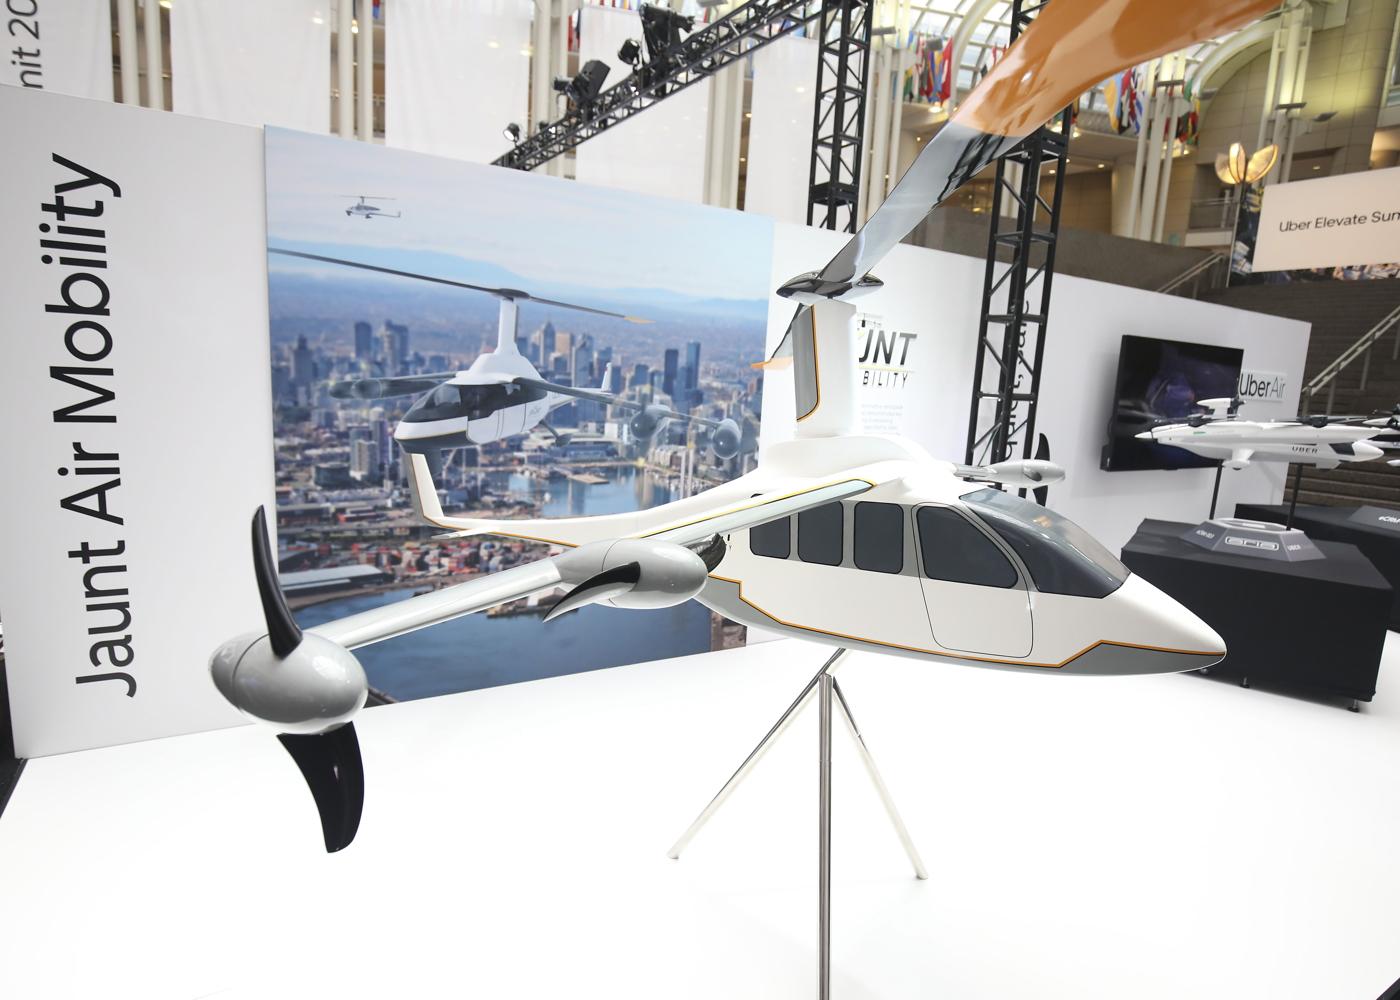 Jaunt Air Mobility eVTOL concept